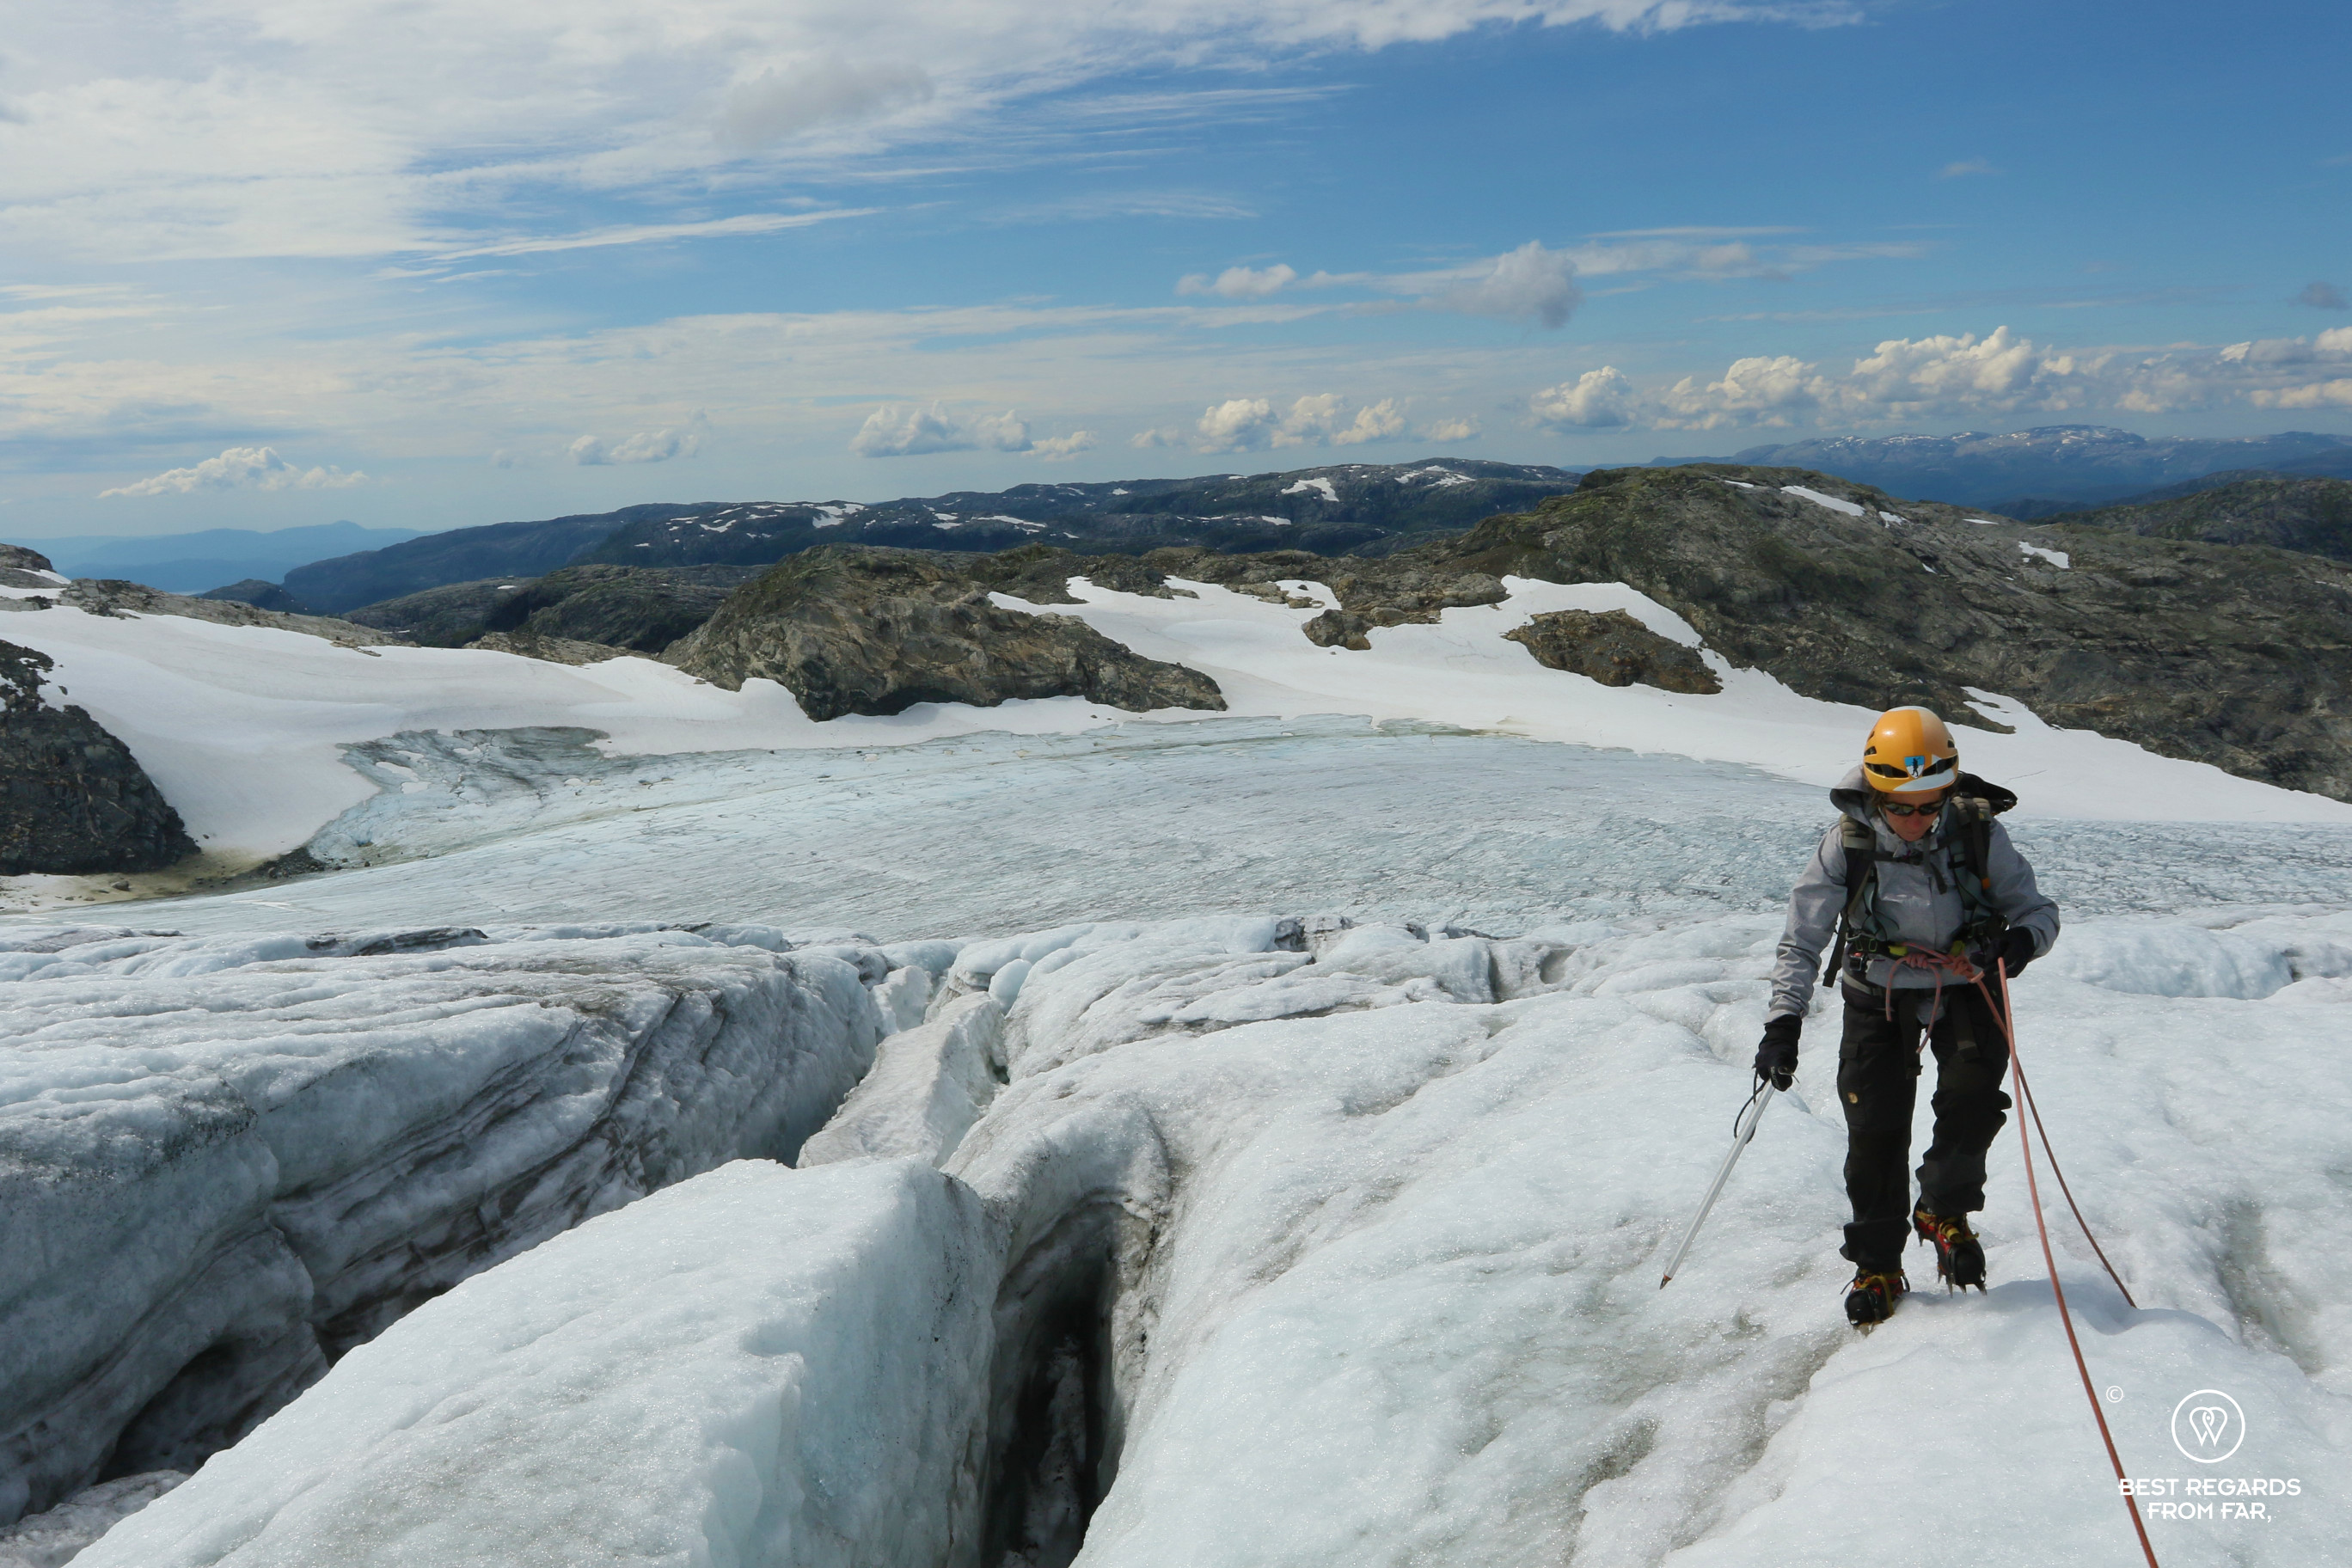 Photographer Claire Lessiau progressing on the Fonna Glacier